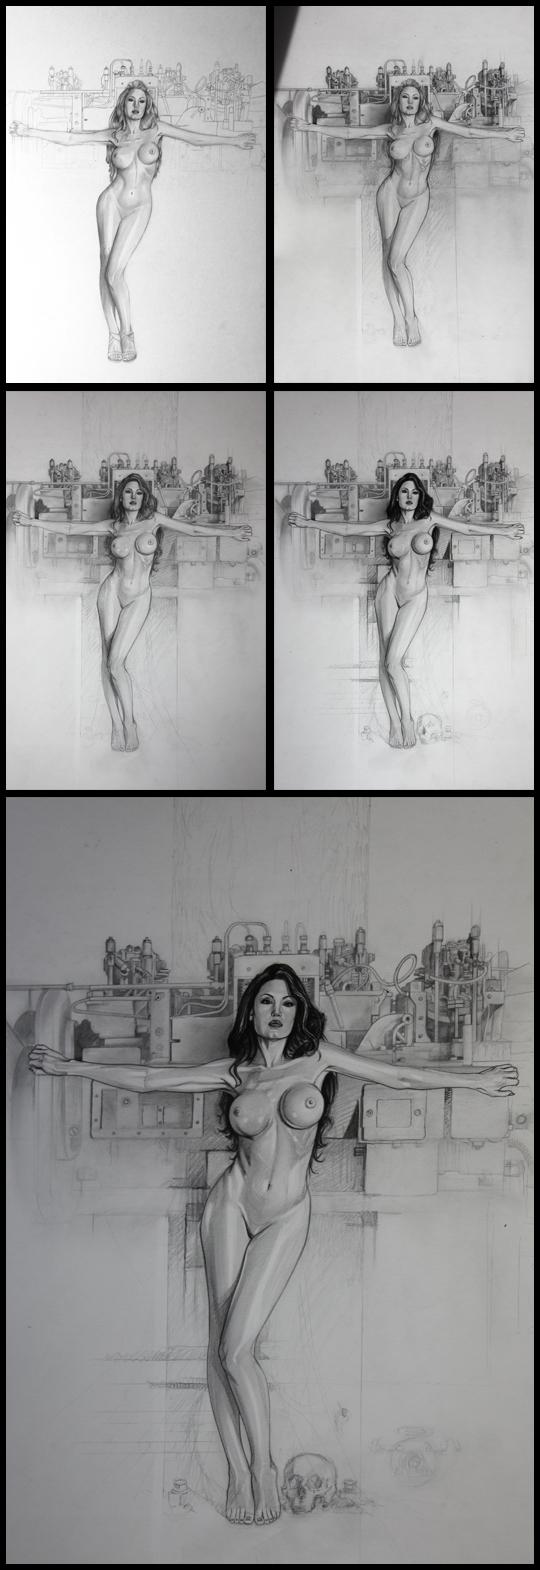 Carlos Diez-ilustracion-imagenes-aerografia-madrid-2